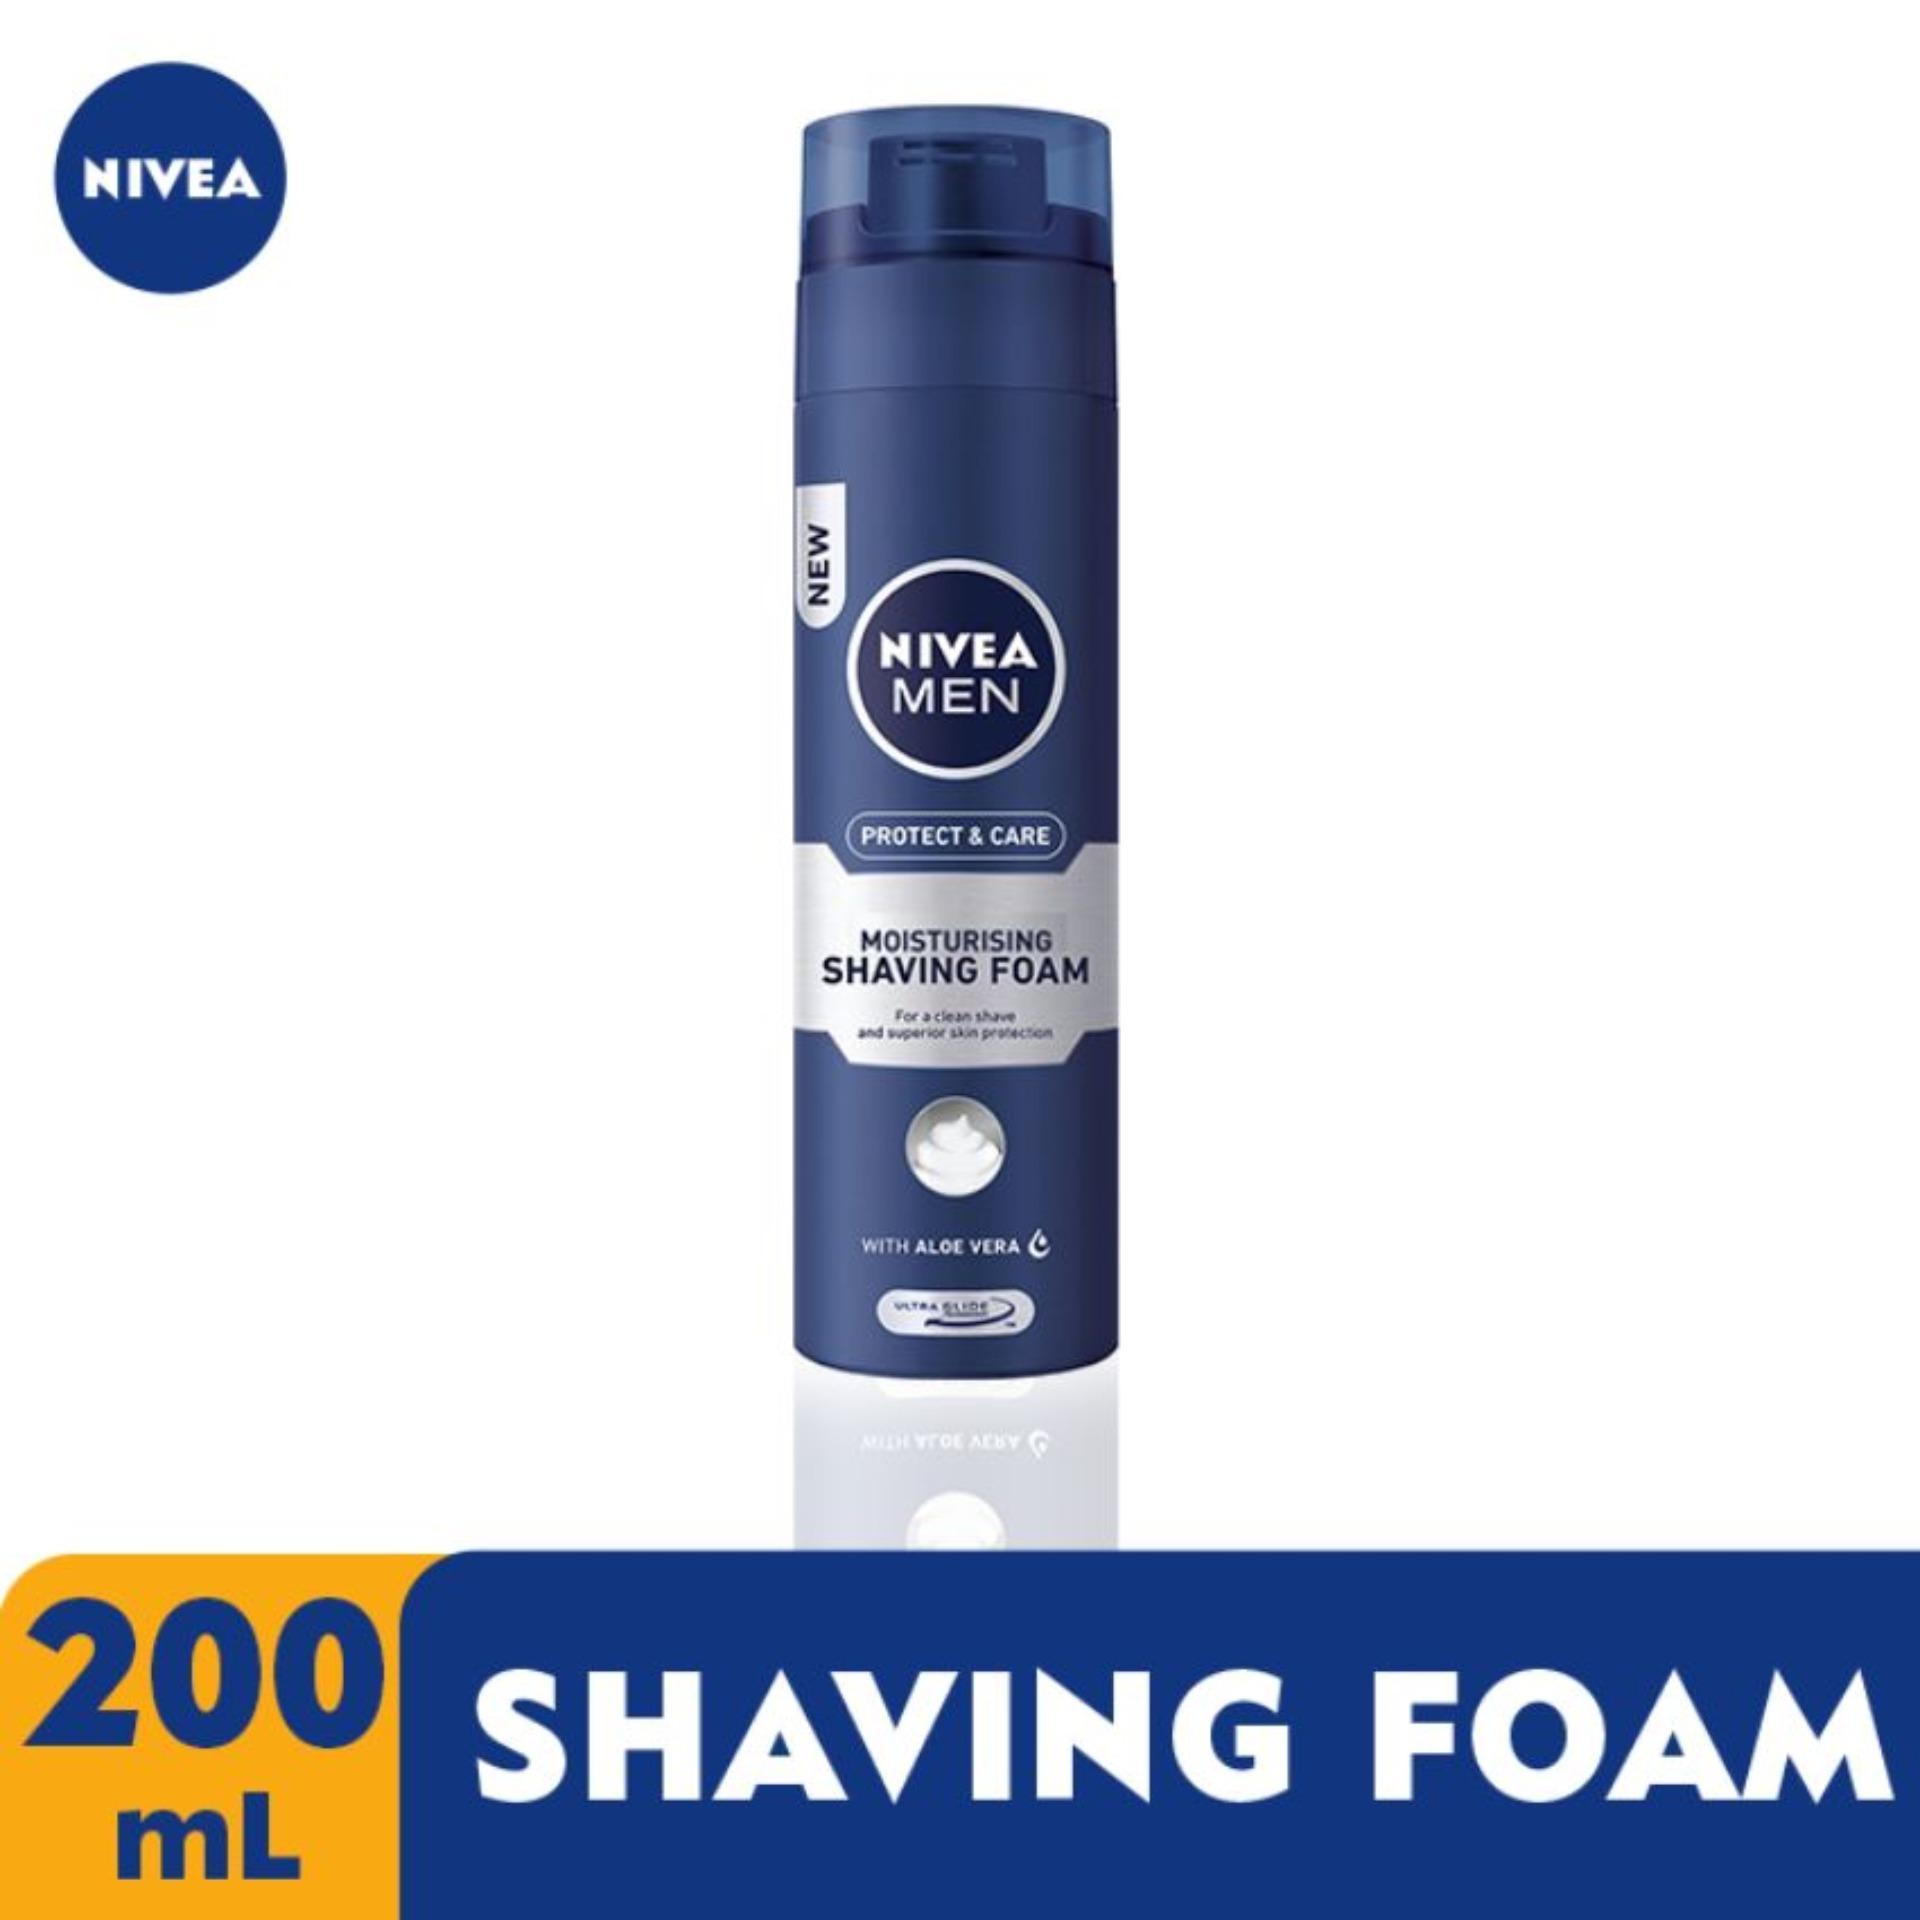 Nivea Men Moisturising Shaving Foam 200ml